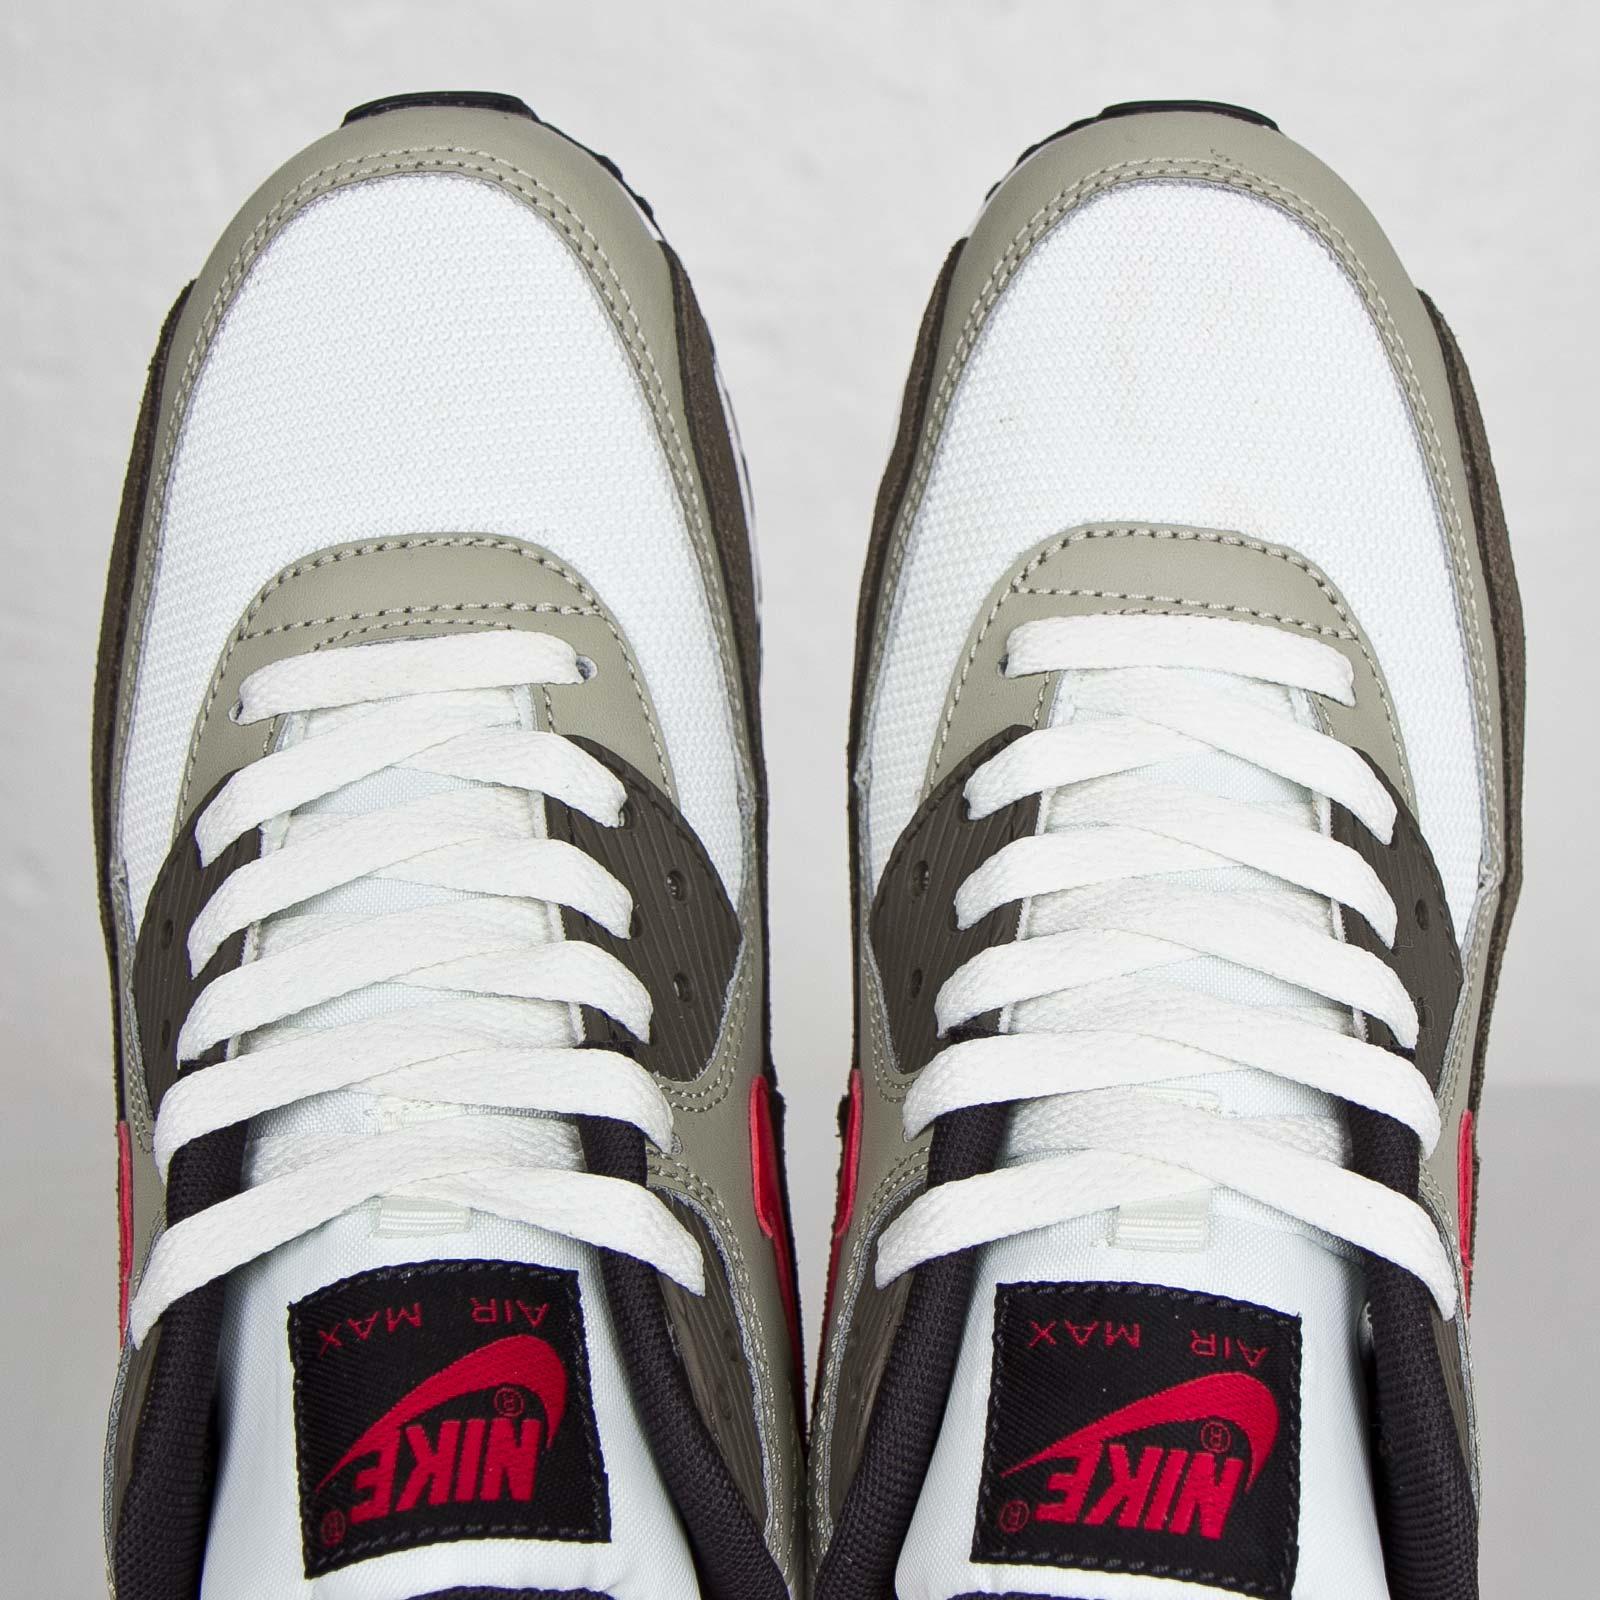 best service 5fbc9 62e01 Nike Air Max 90 Essential - 537384-119 - Sneakersnstuff I Sneakers ...